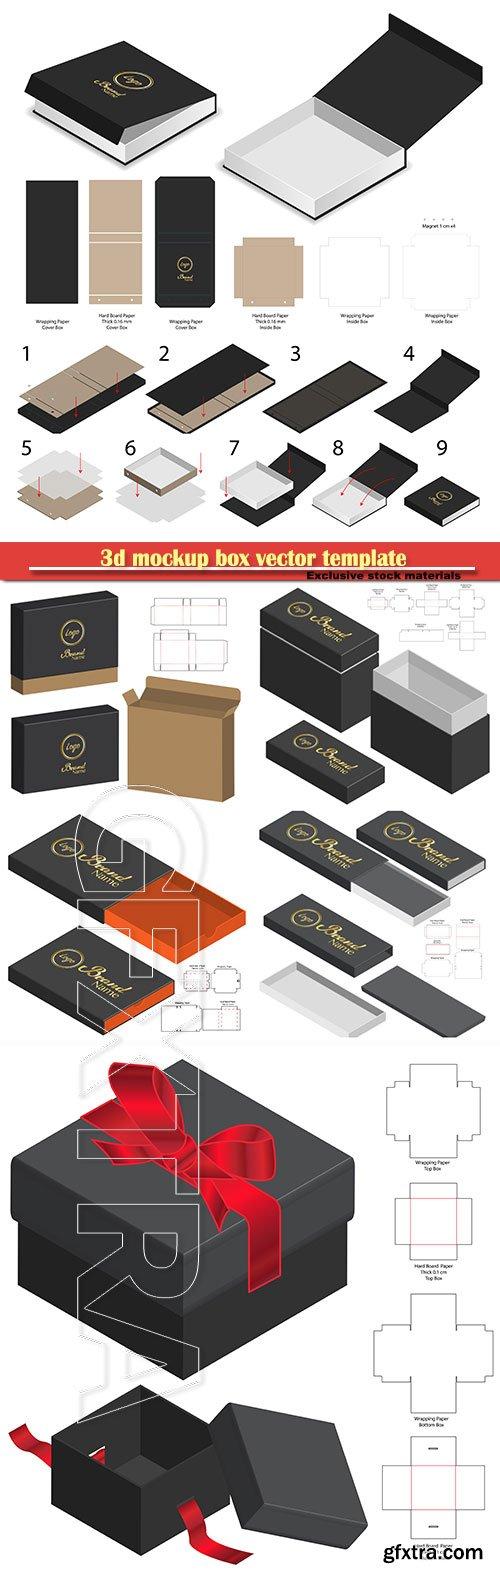 3d mockup box vector template